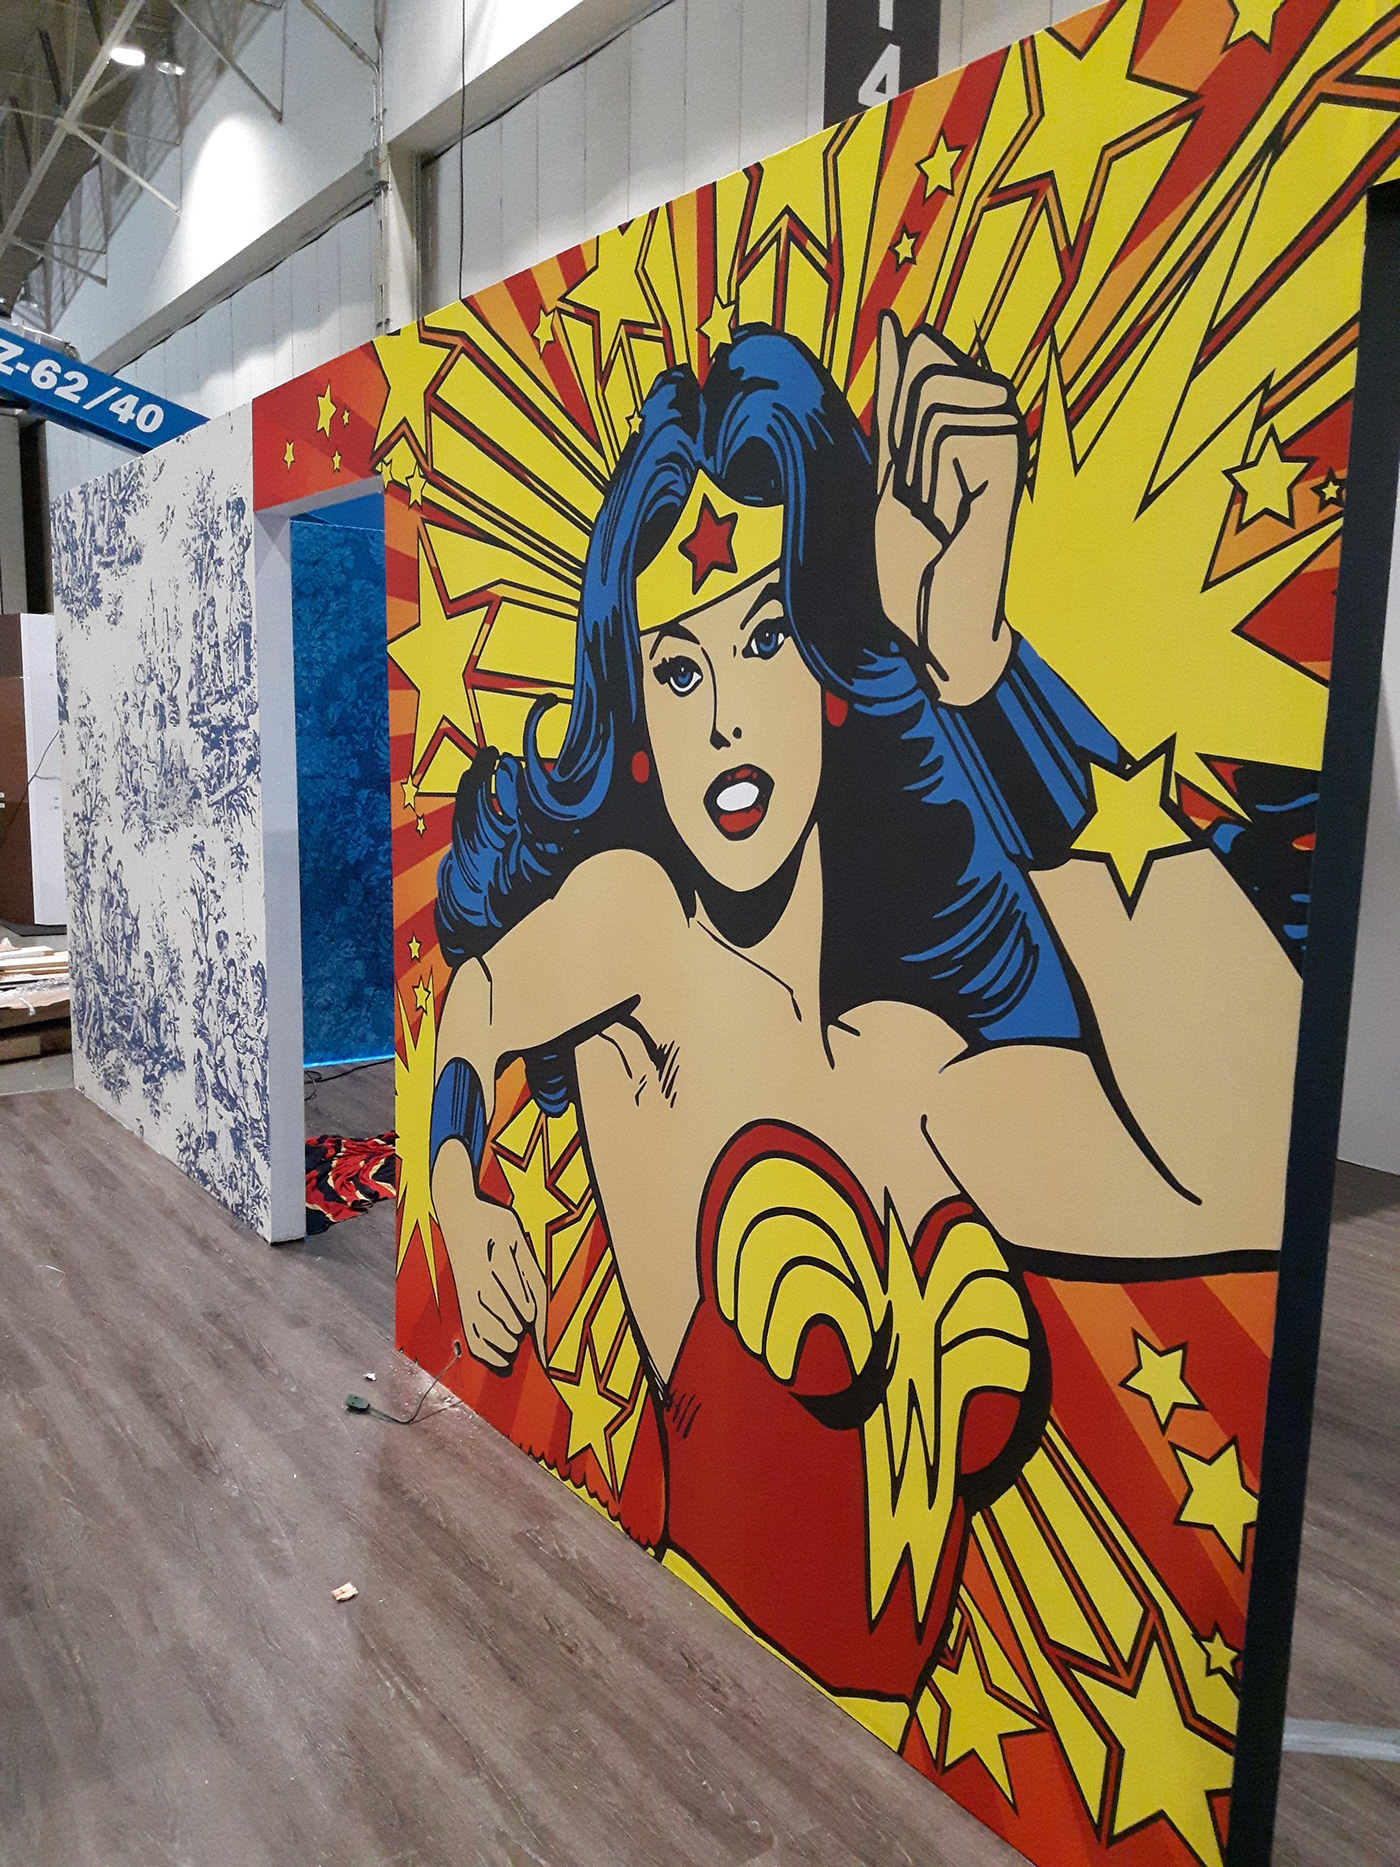 custom print Murals wallpaper design interior design  custom design printed murals installed graphics graphic design  Printed Wallpaper